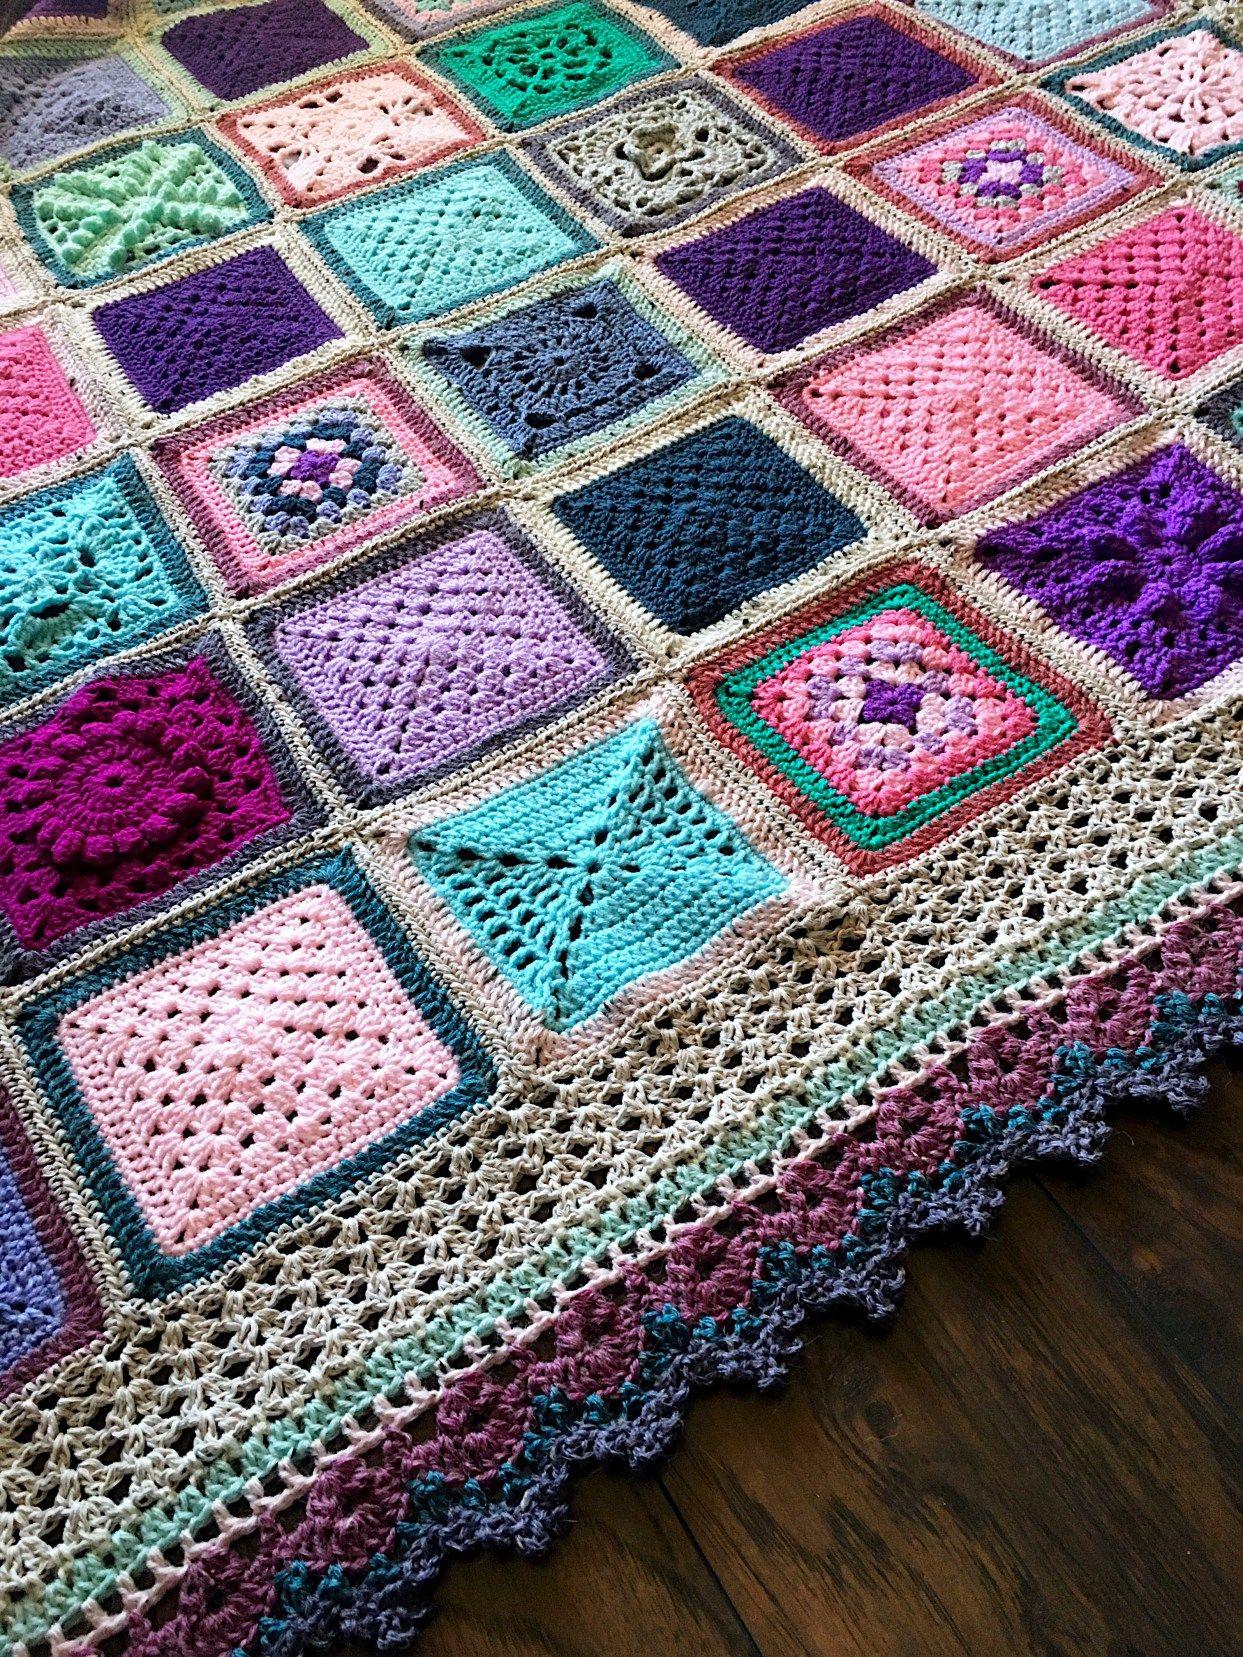 Vvcal Vibrant Vintage Crochet Blanket  Main Info Page (2016